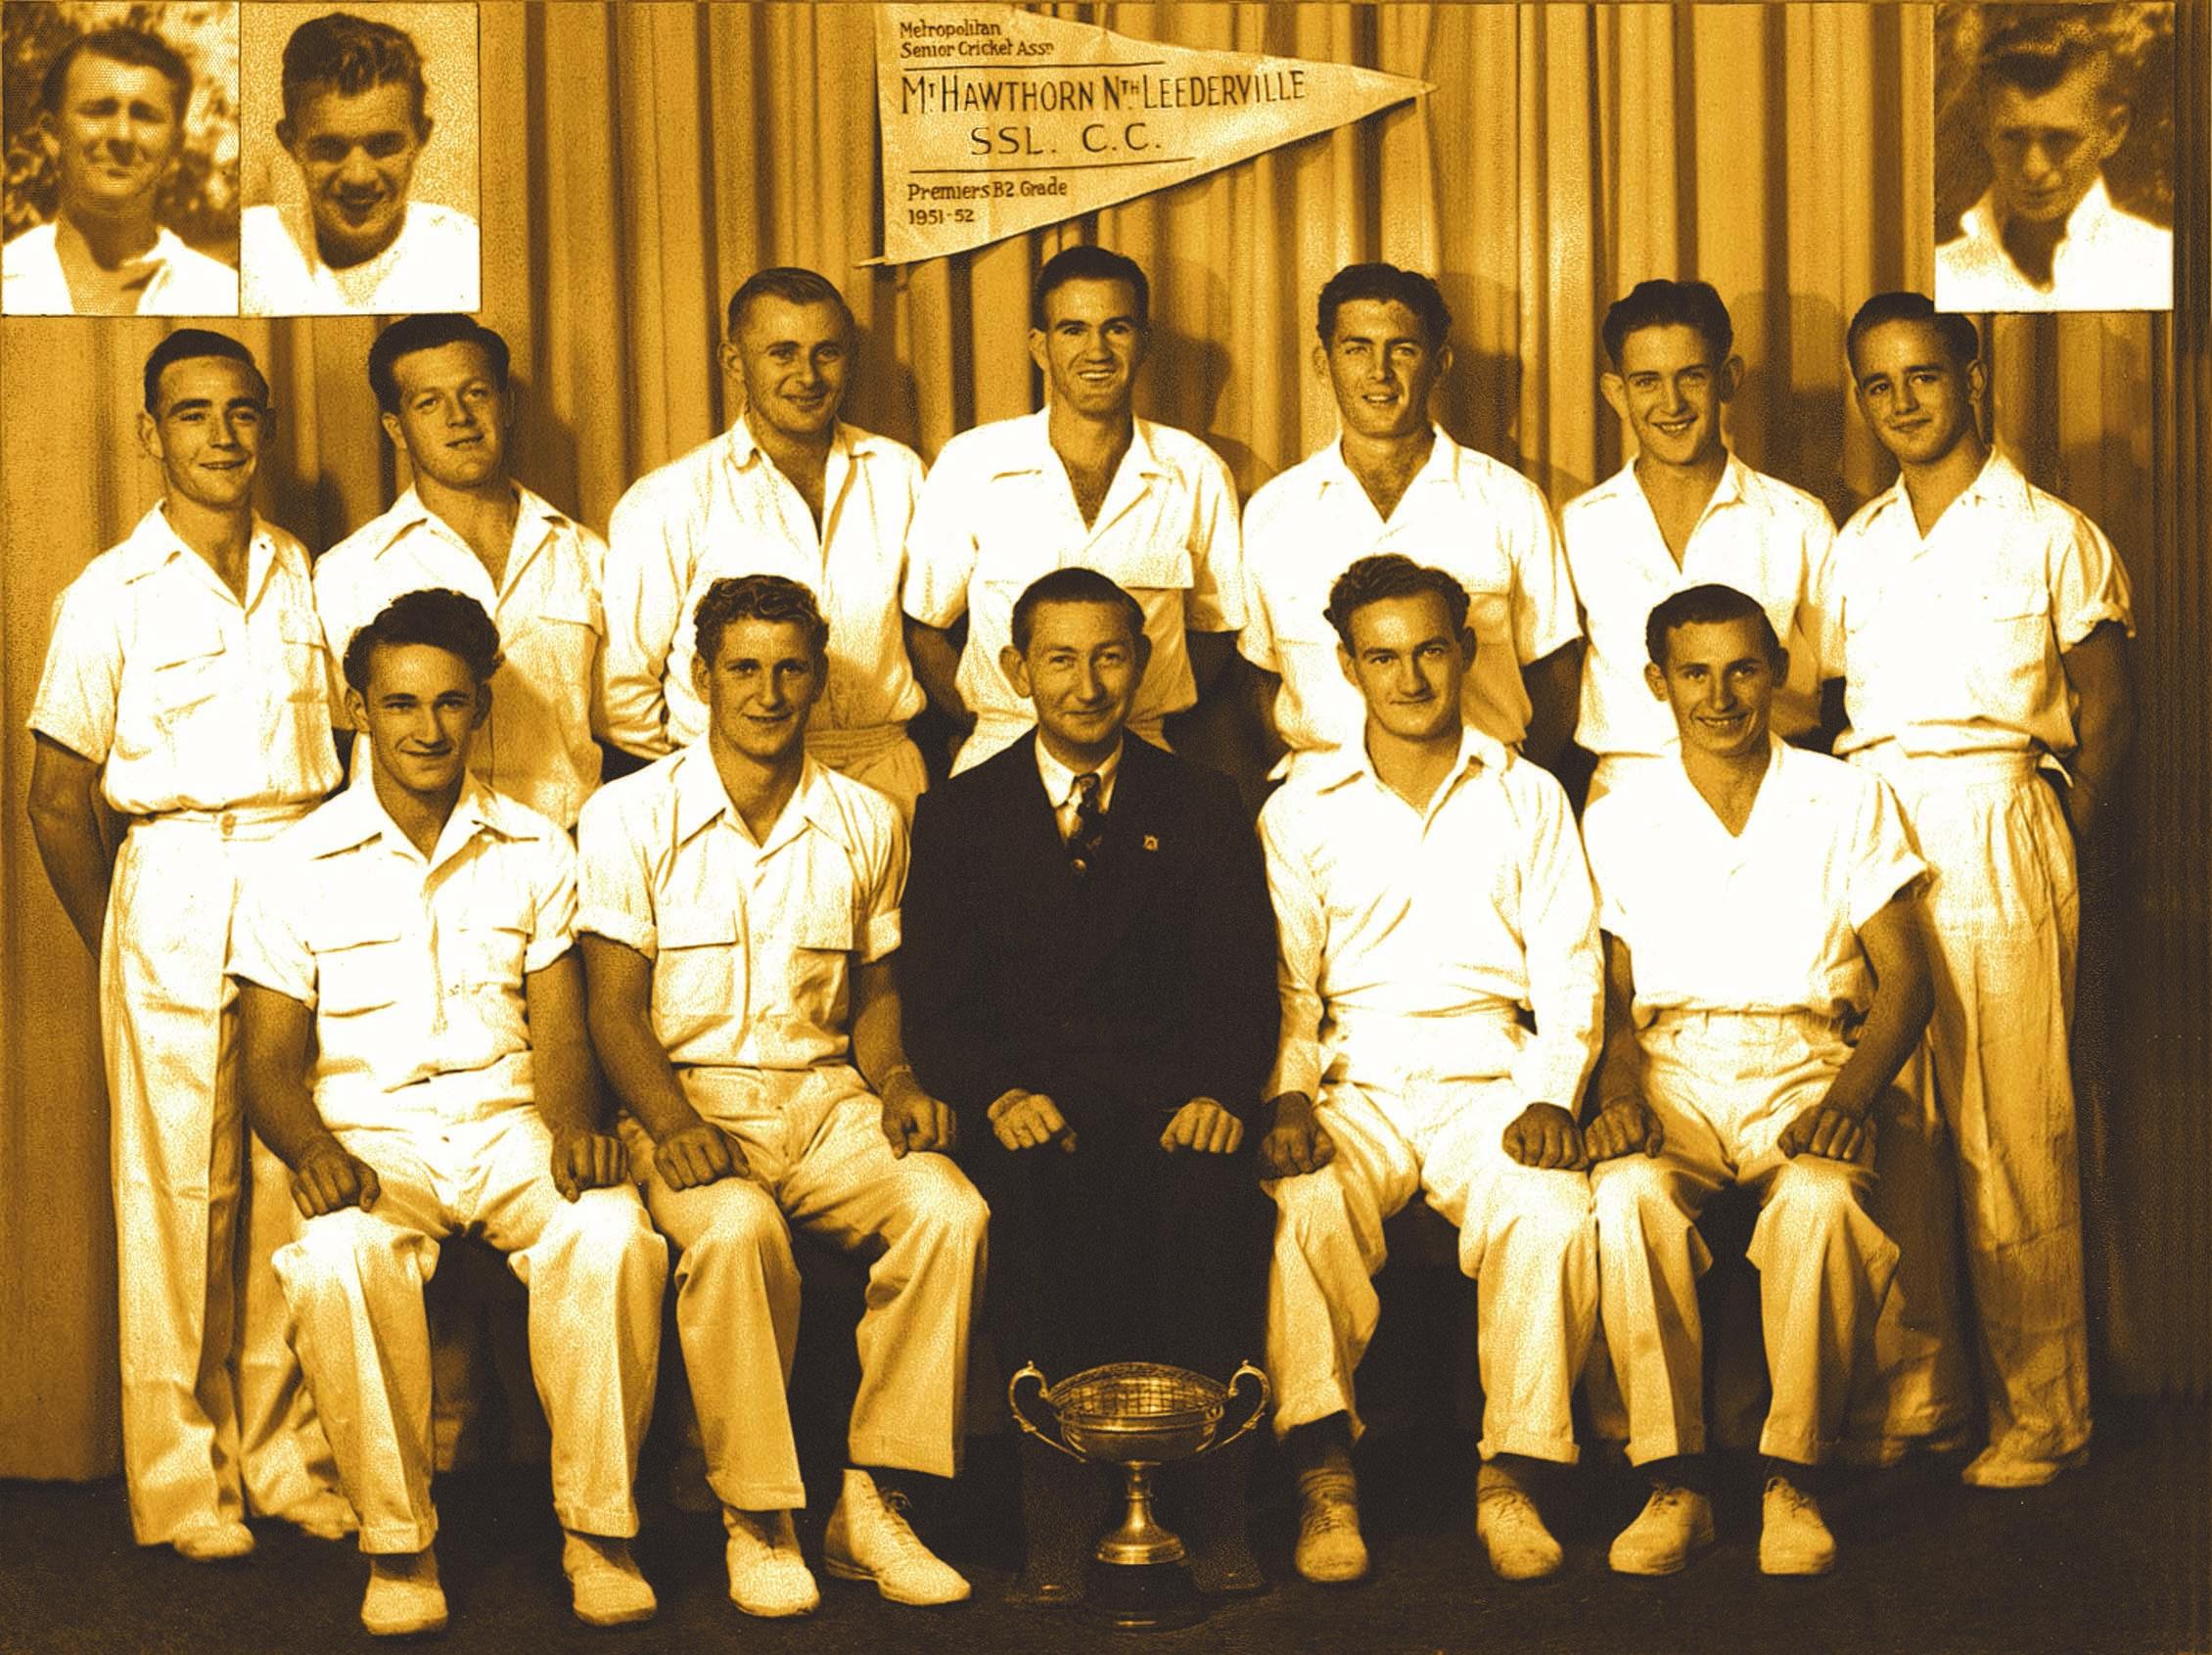 100. Leederville Cricket Club, 1951